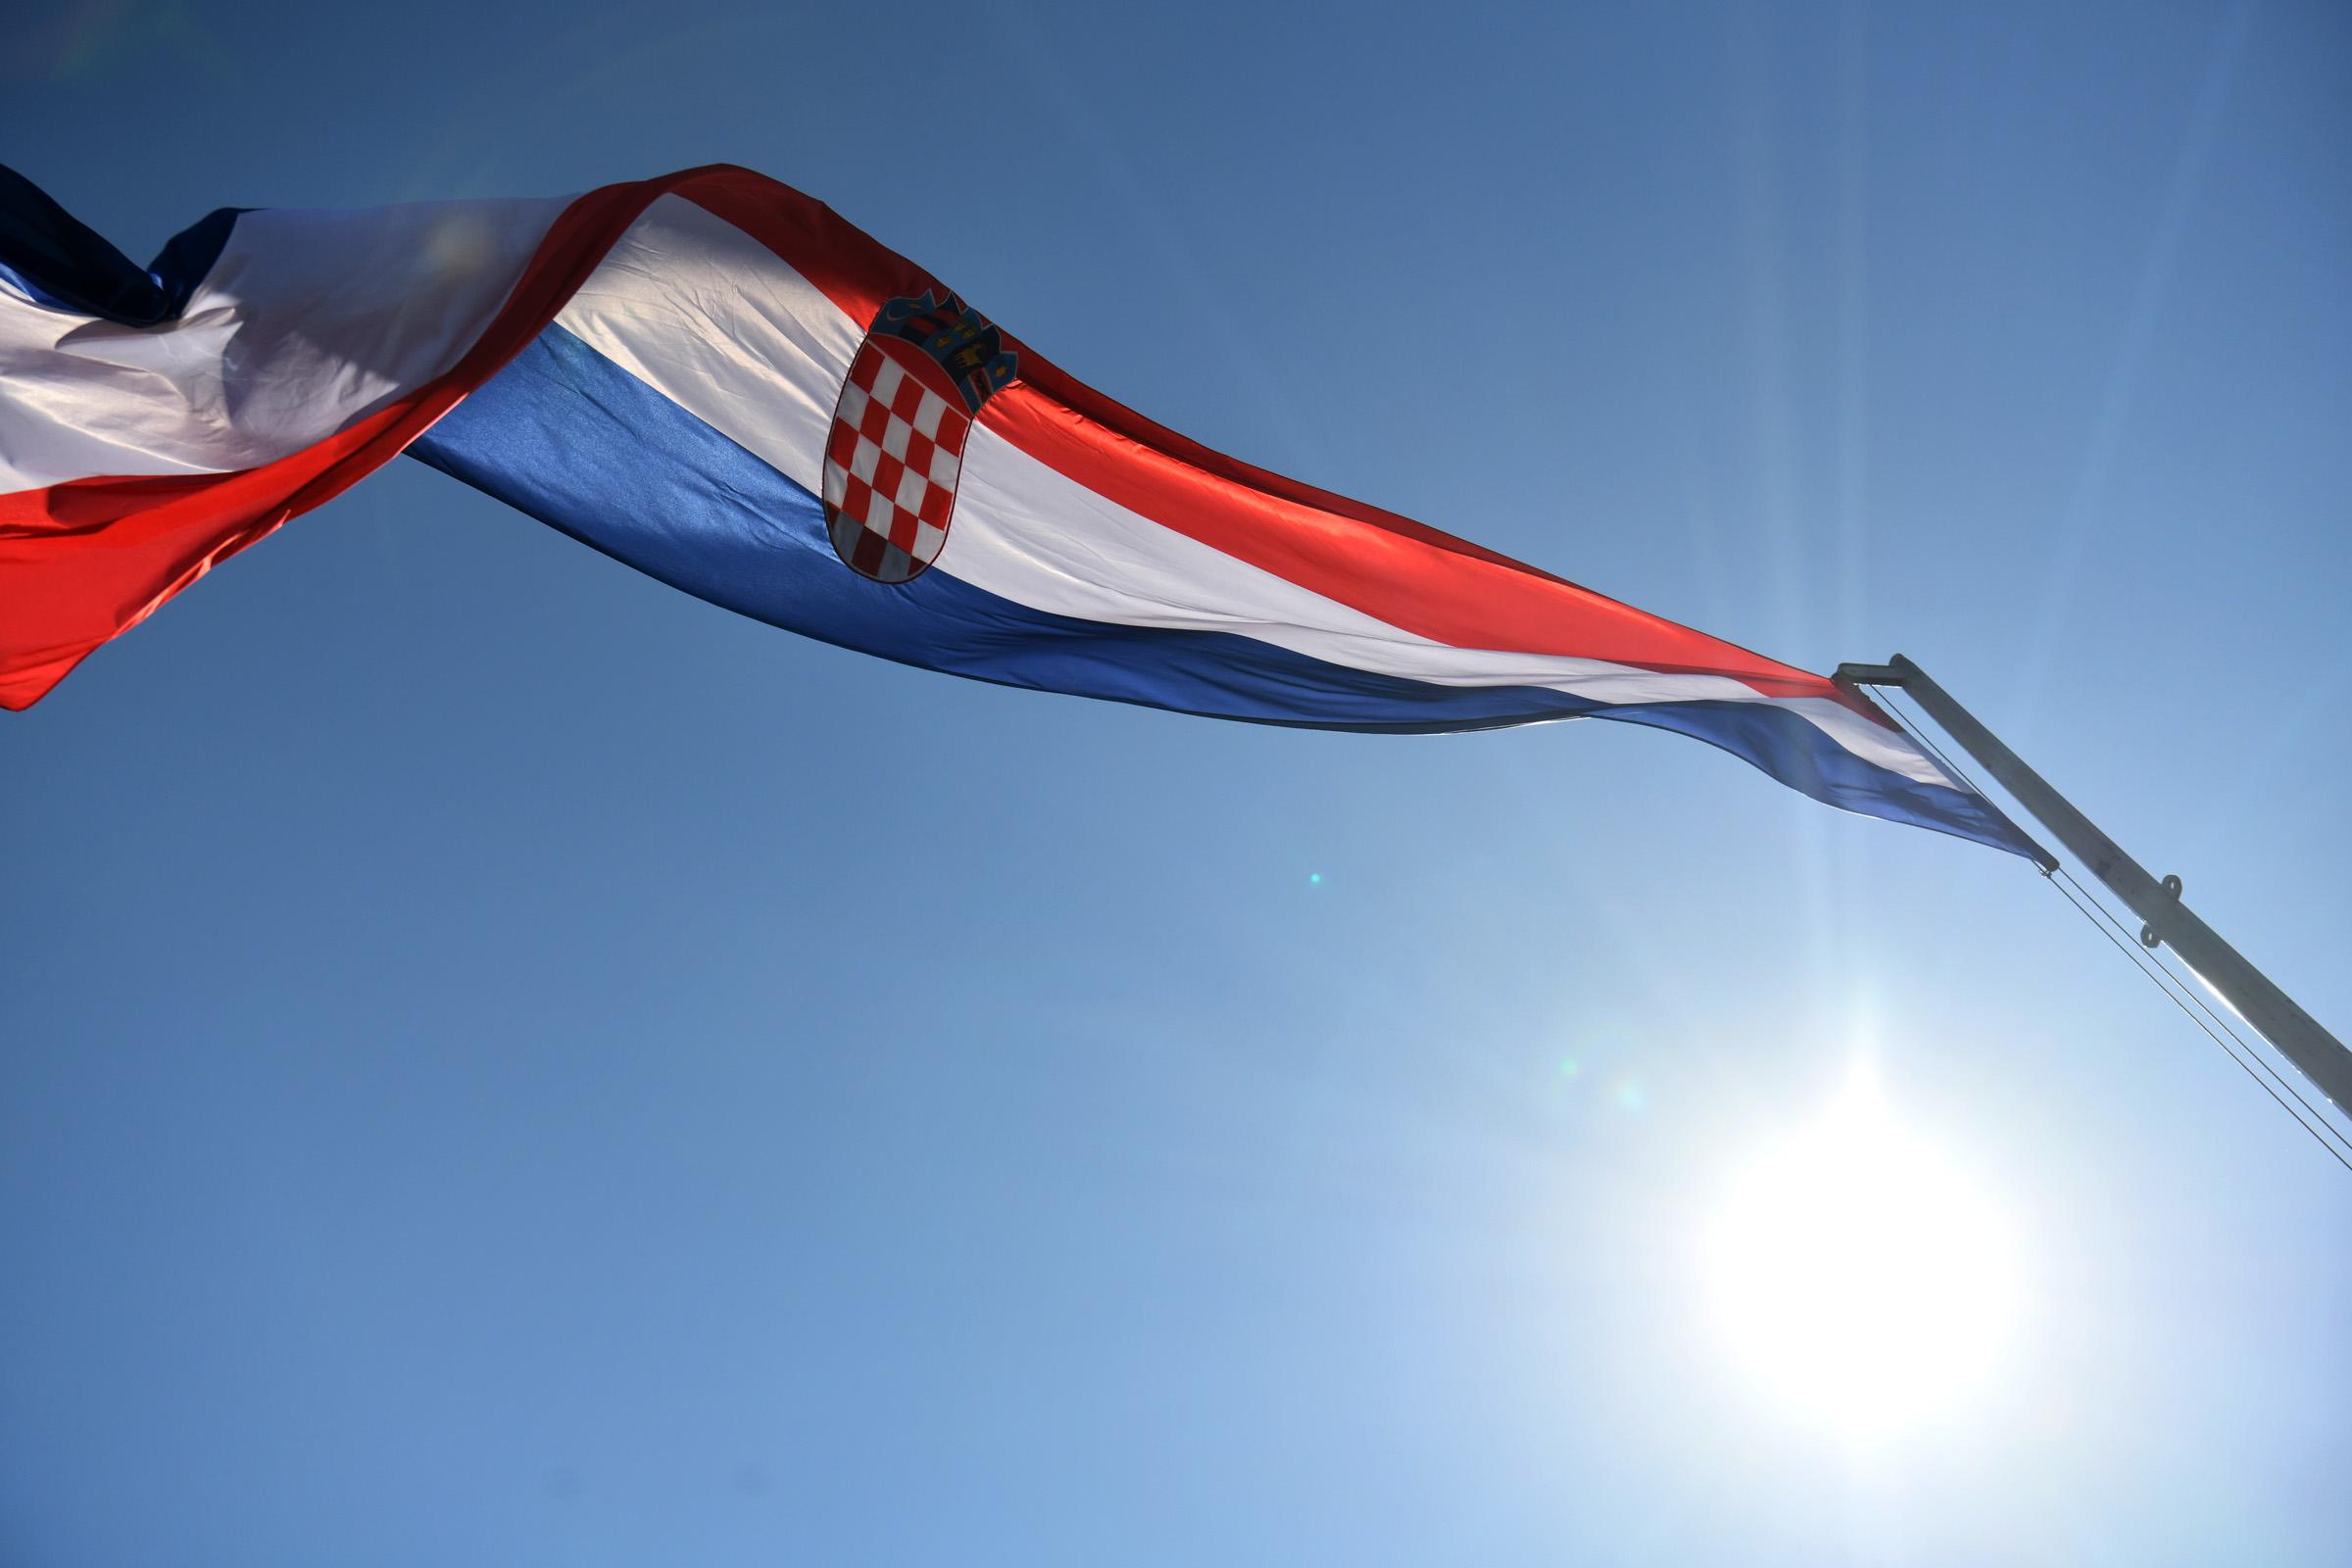 Dan je pobjede i domovinske zahvalnosti, Dan hrvatskih branitelja i 26. obljetnica vojno-redarstvene operacije Oluja